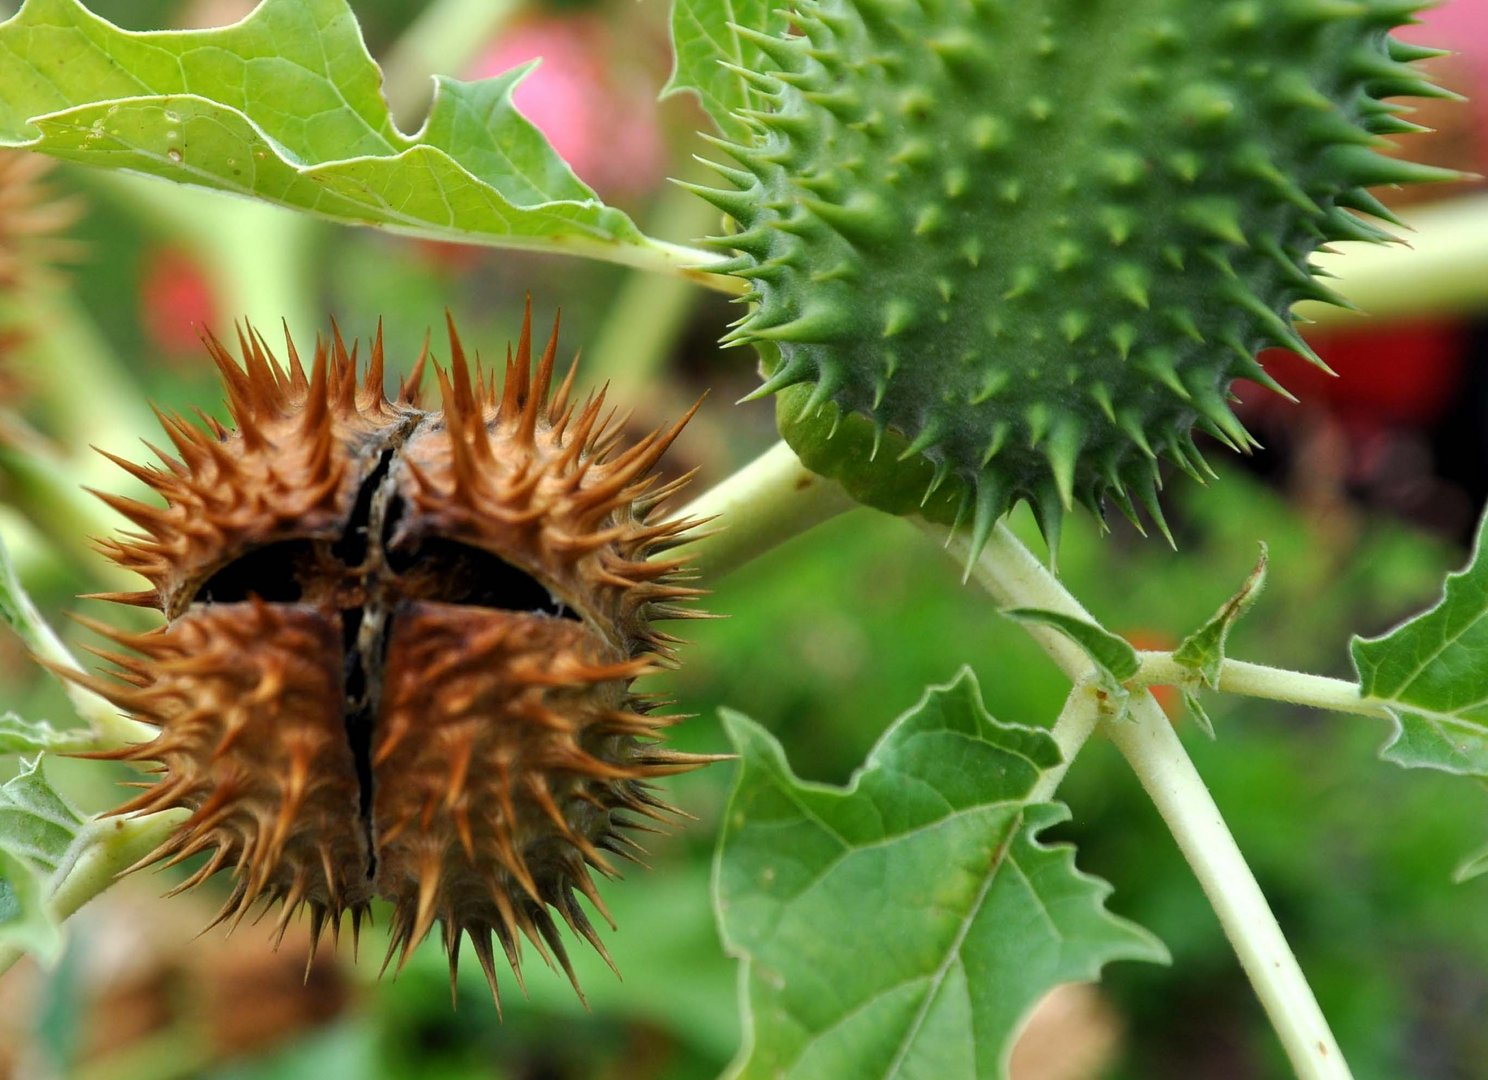 rizinus frucht foto bild pflanzen pilze flechten. Black Bedroom Furniture Sets. Home Design Ideas